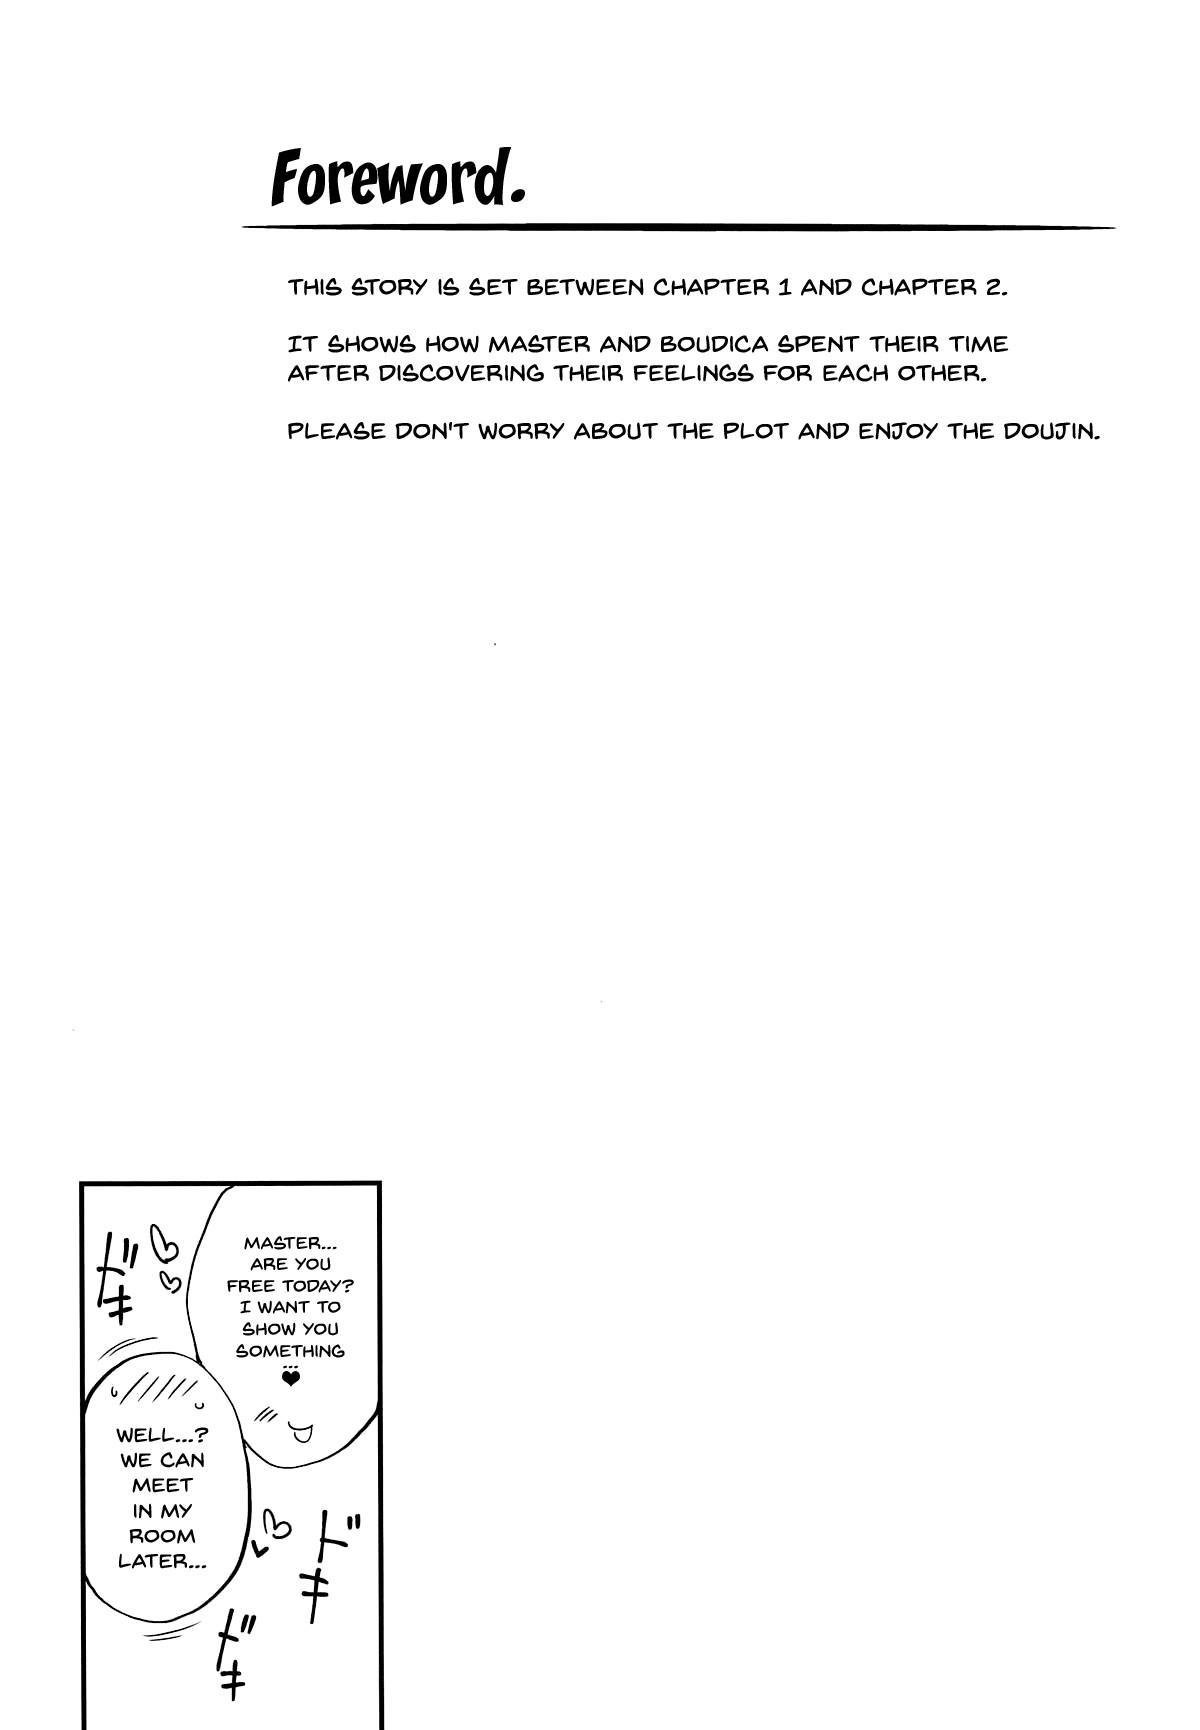 (COMIC1☆15) [Mata Ashita. (Oohira Sunset)] Boudica-san to Gom. -Condom Hen- | Boudica-san and Gom. -Condom Edition (Fate/Grand Order) [English] {Doujins.com} 2